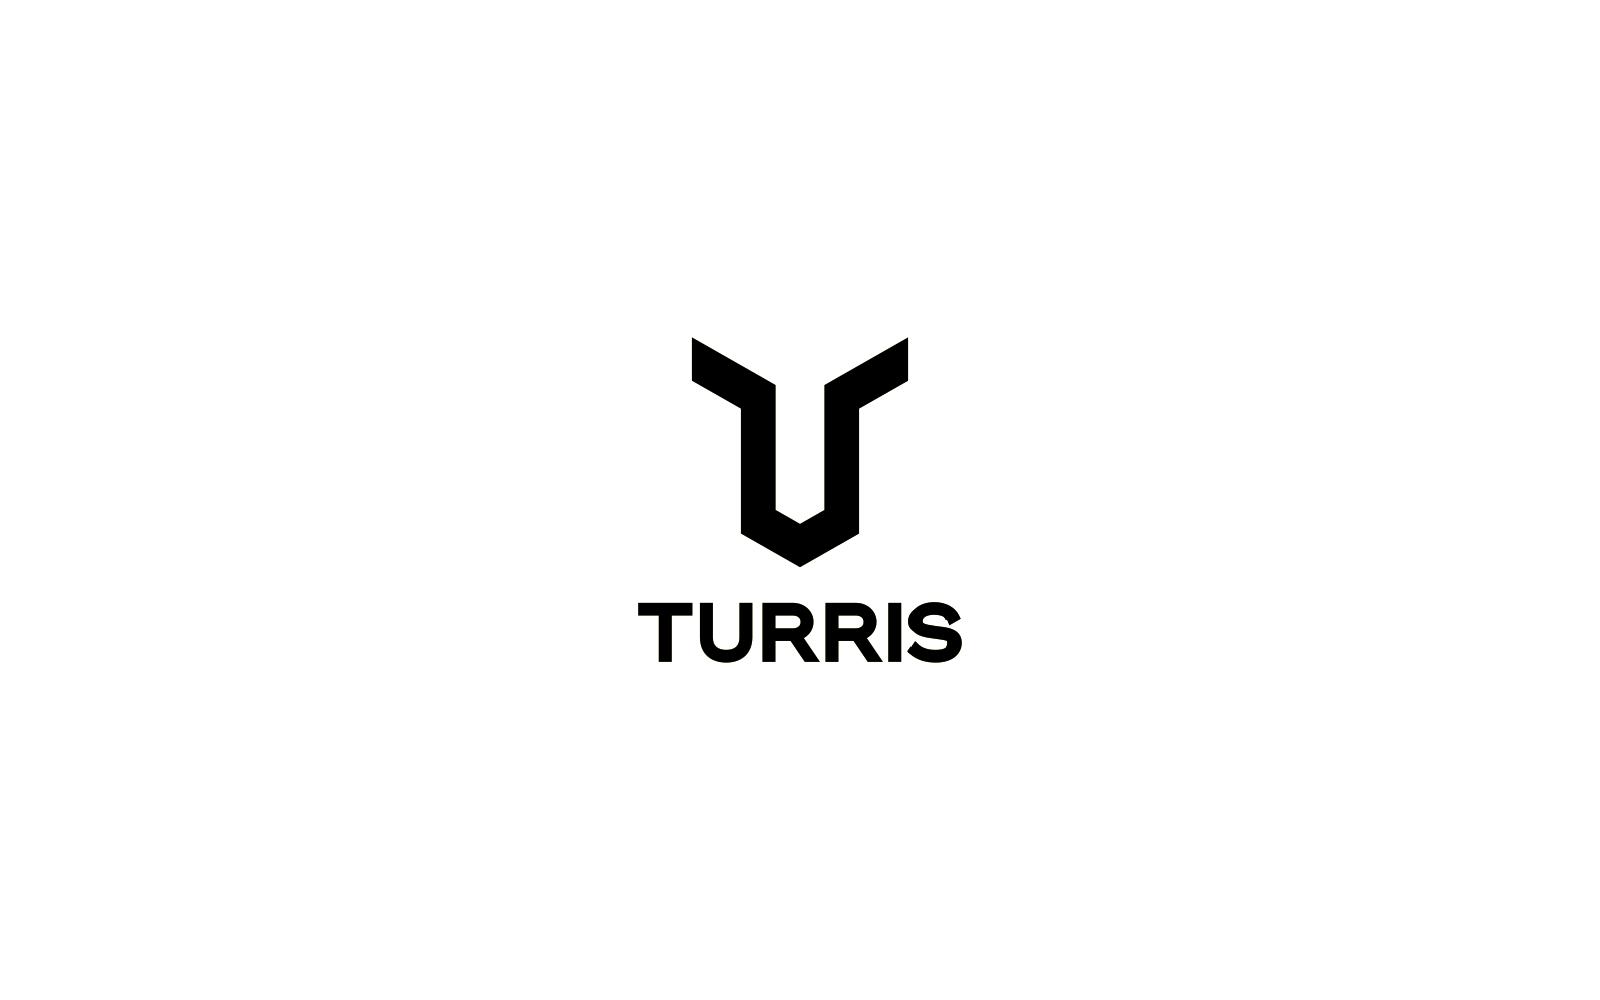 turris logo in black and white